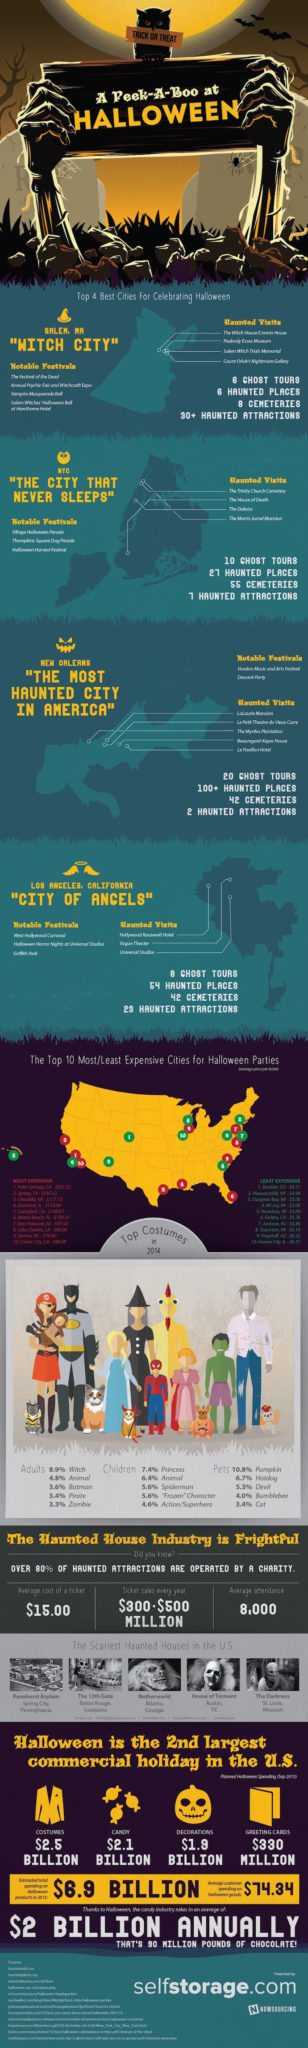 HalloweenCities